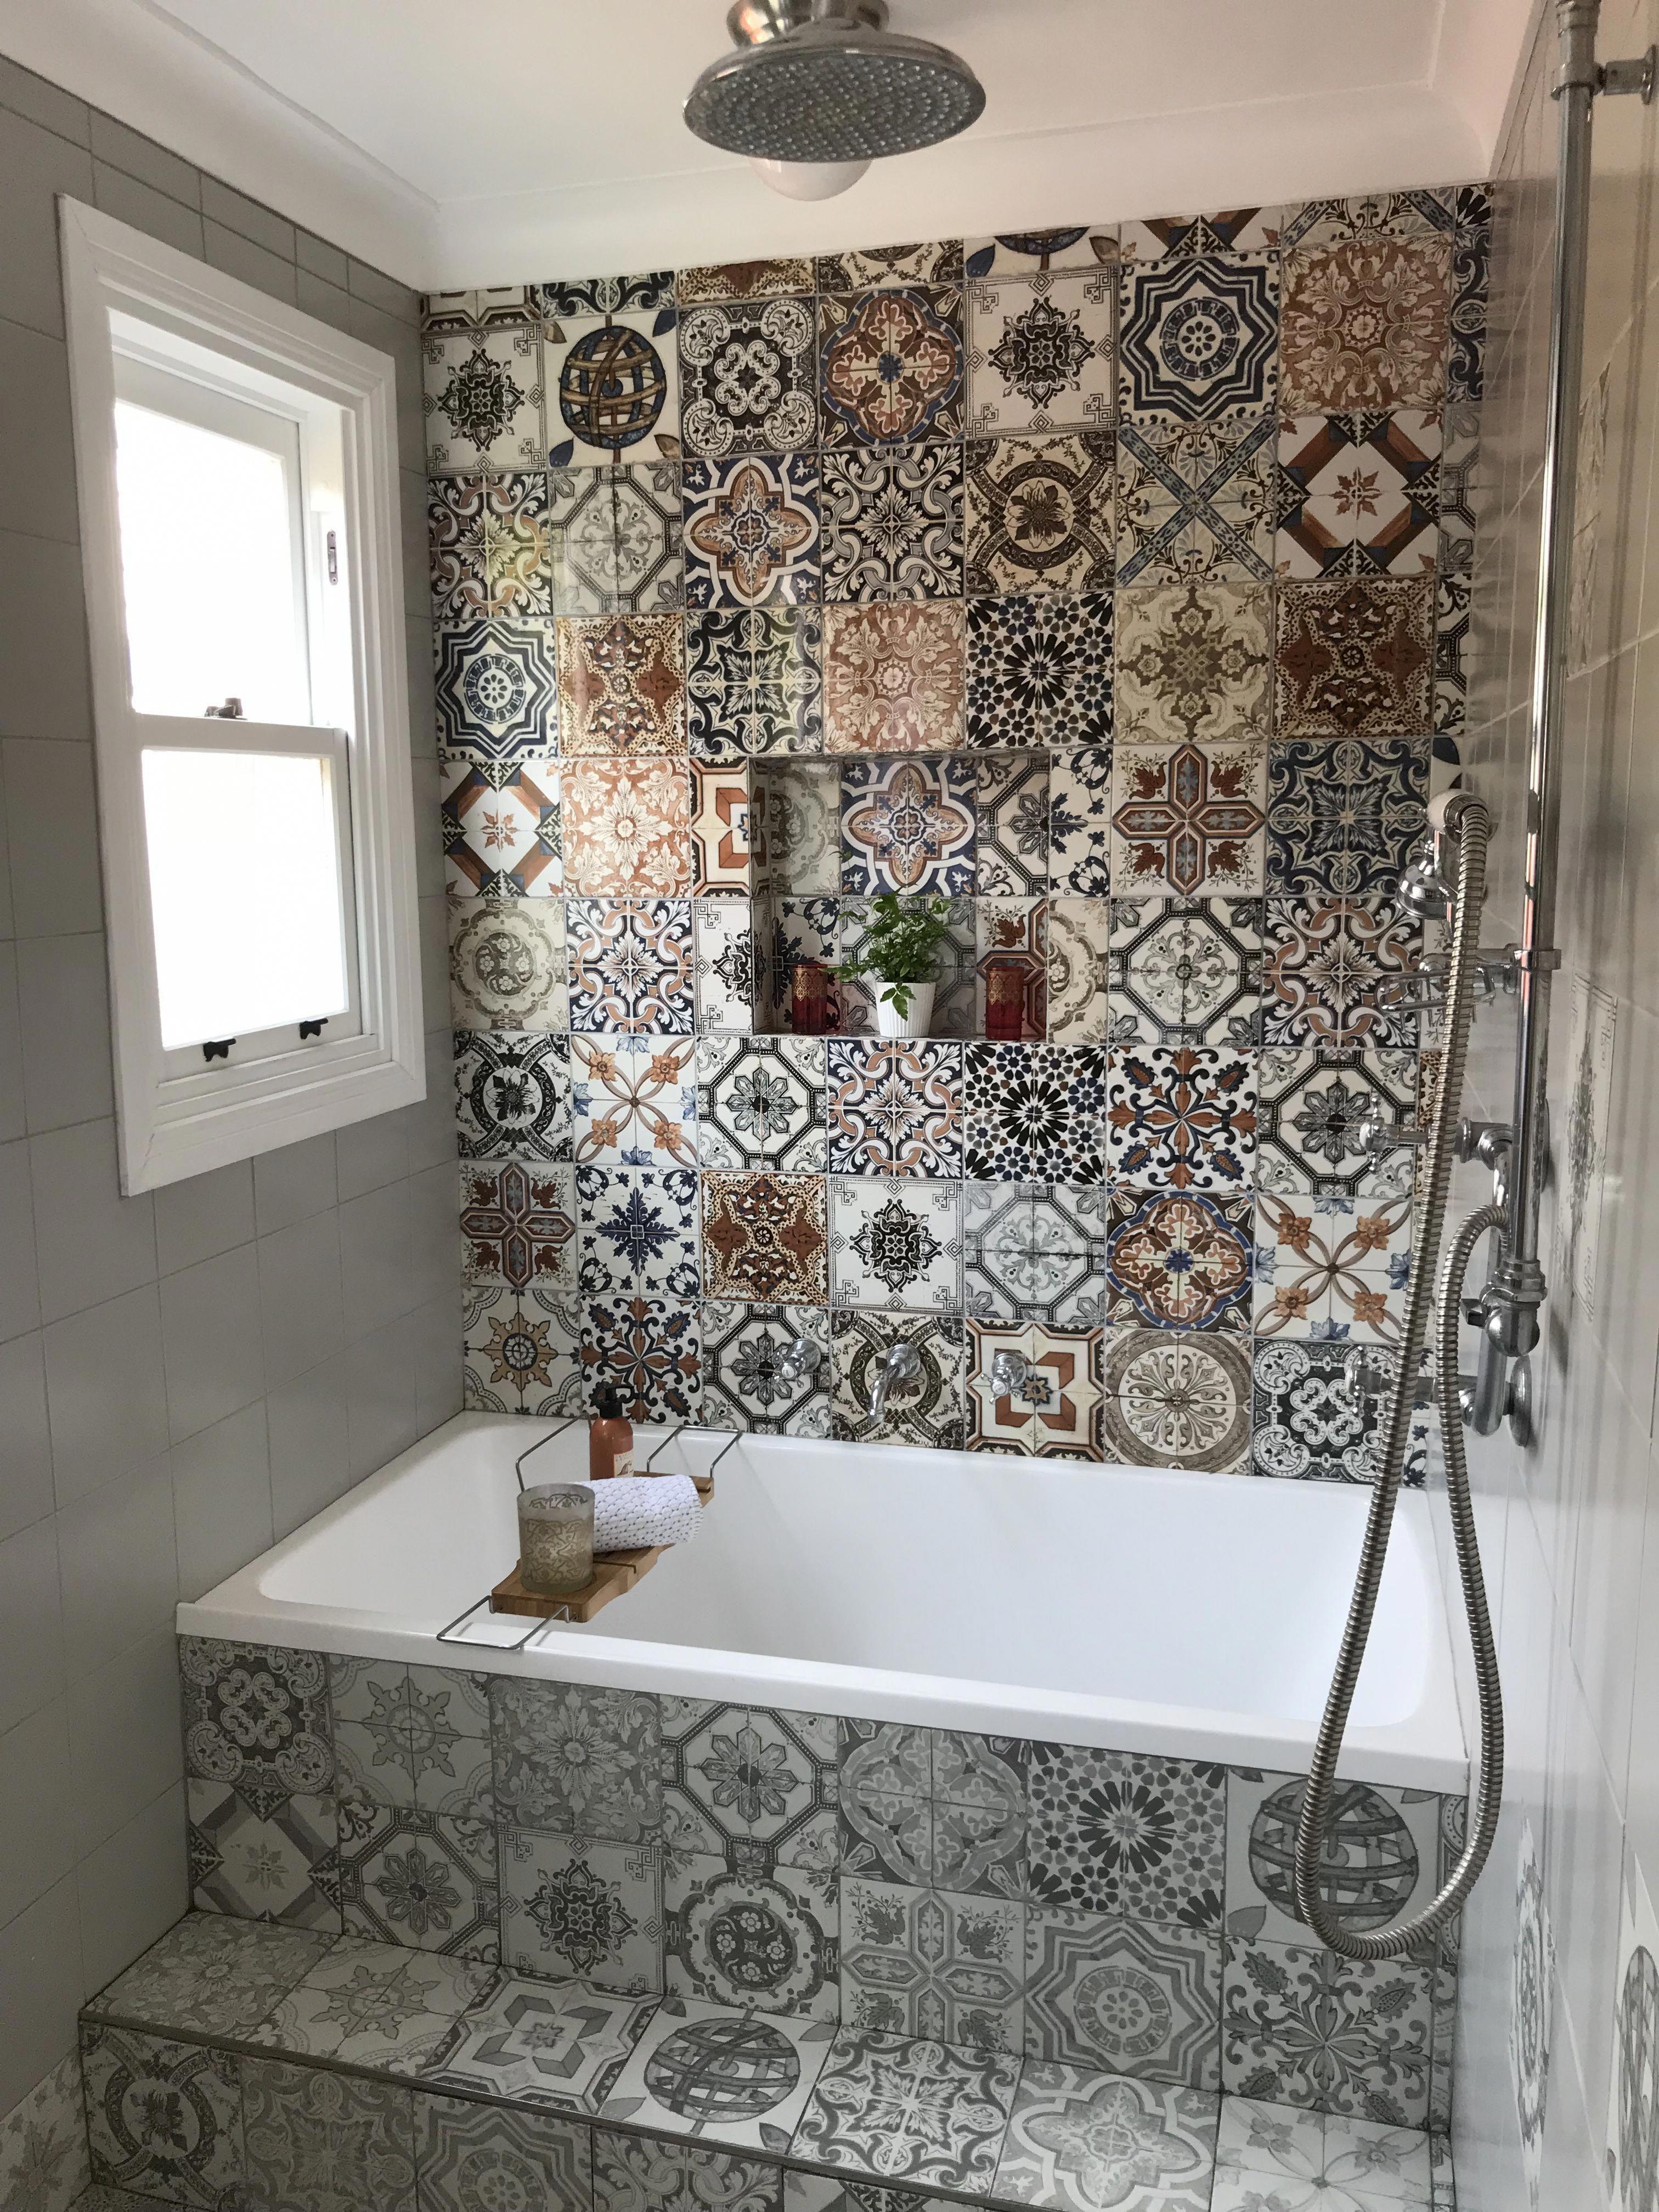 Bathrooms With Metals And Gold Details En 2020 Diseno Banos